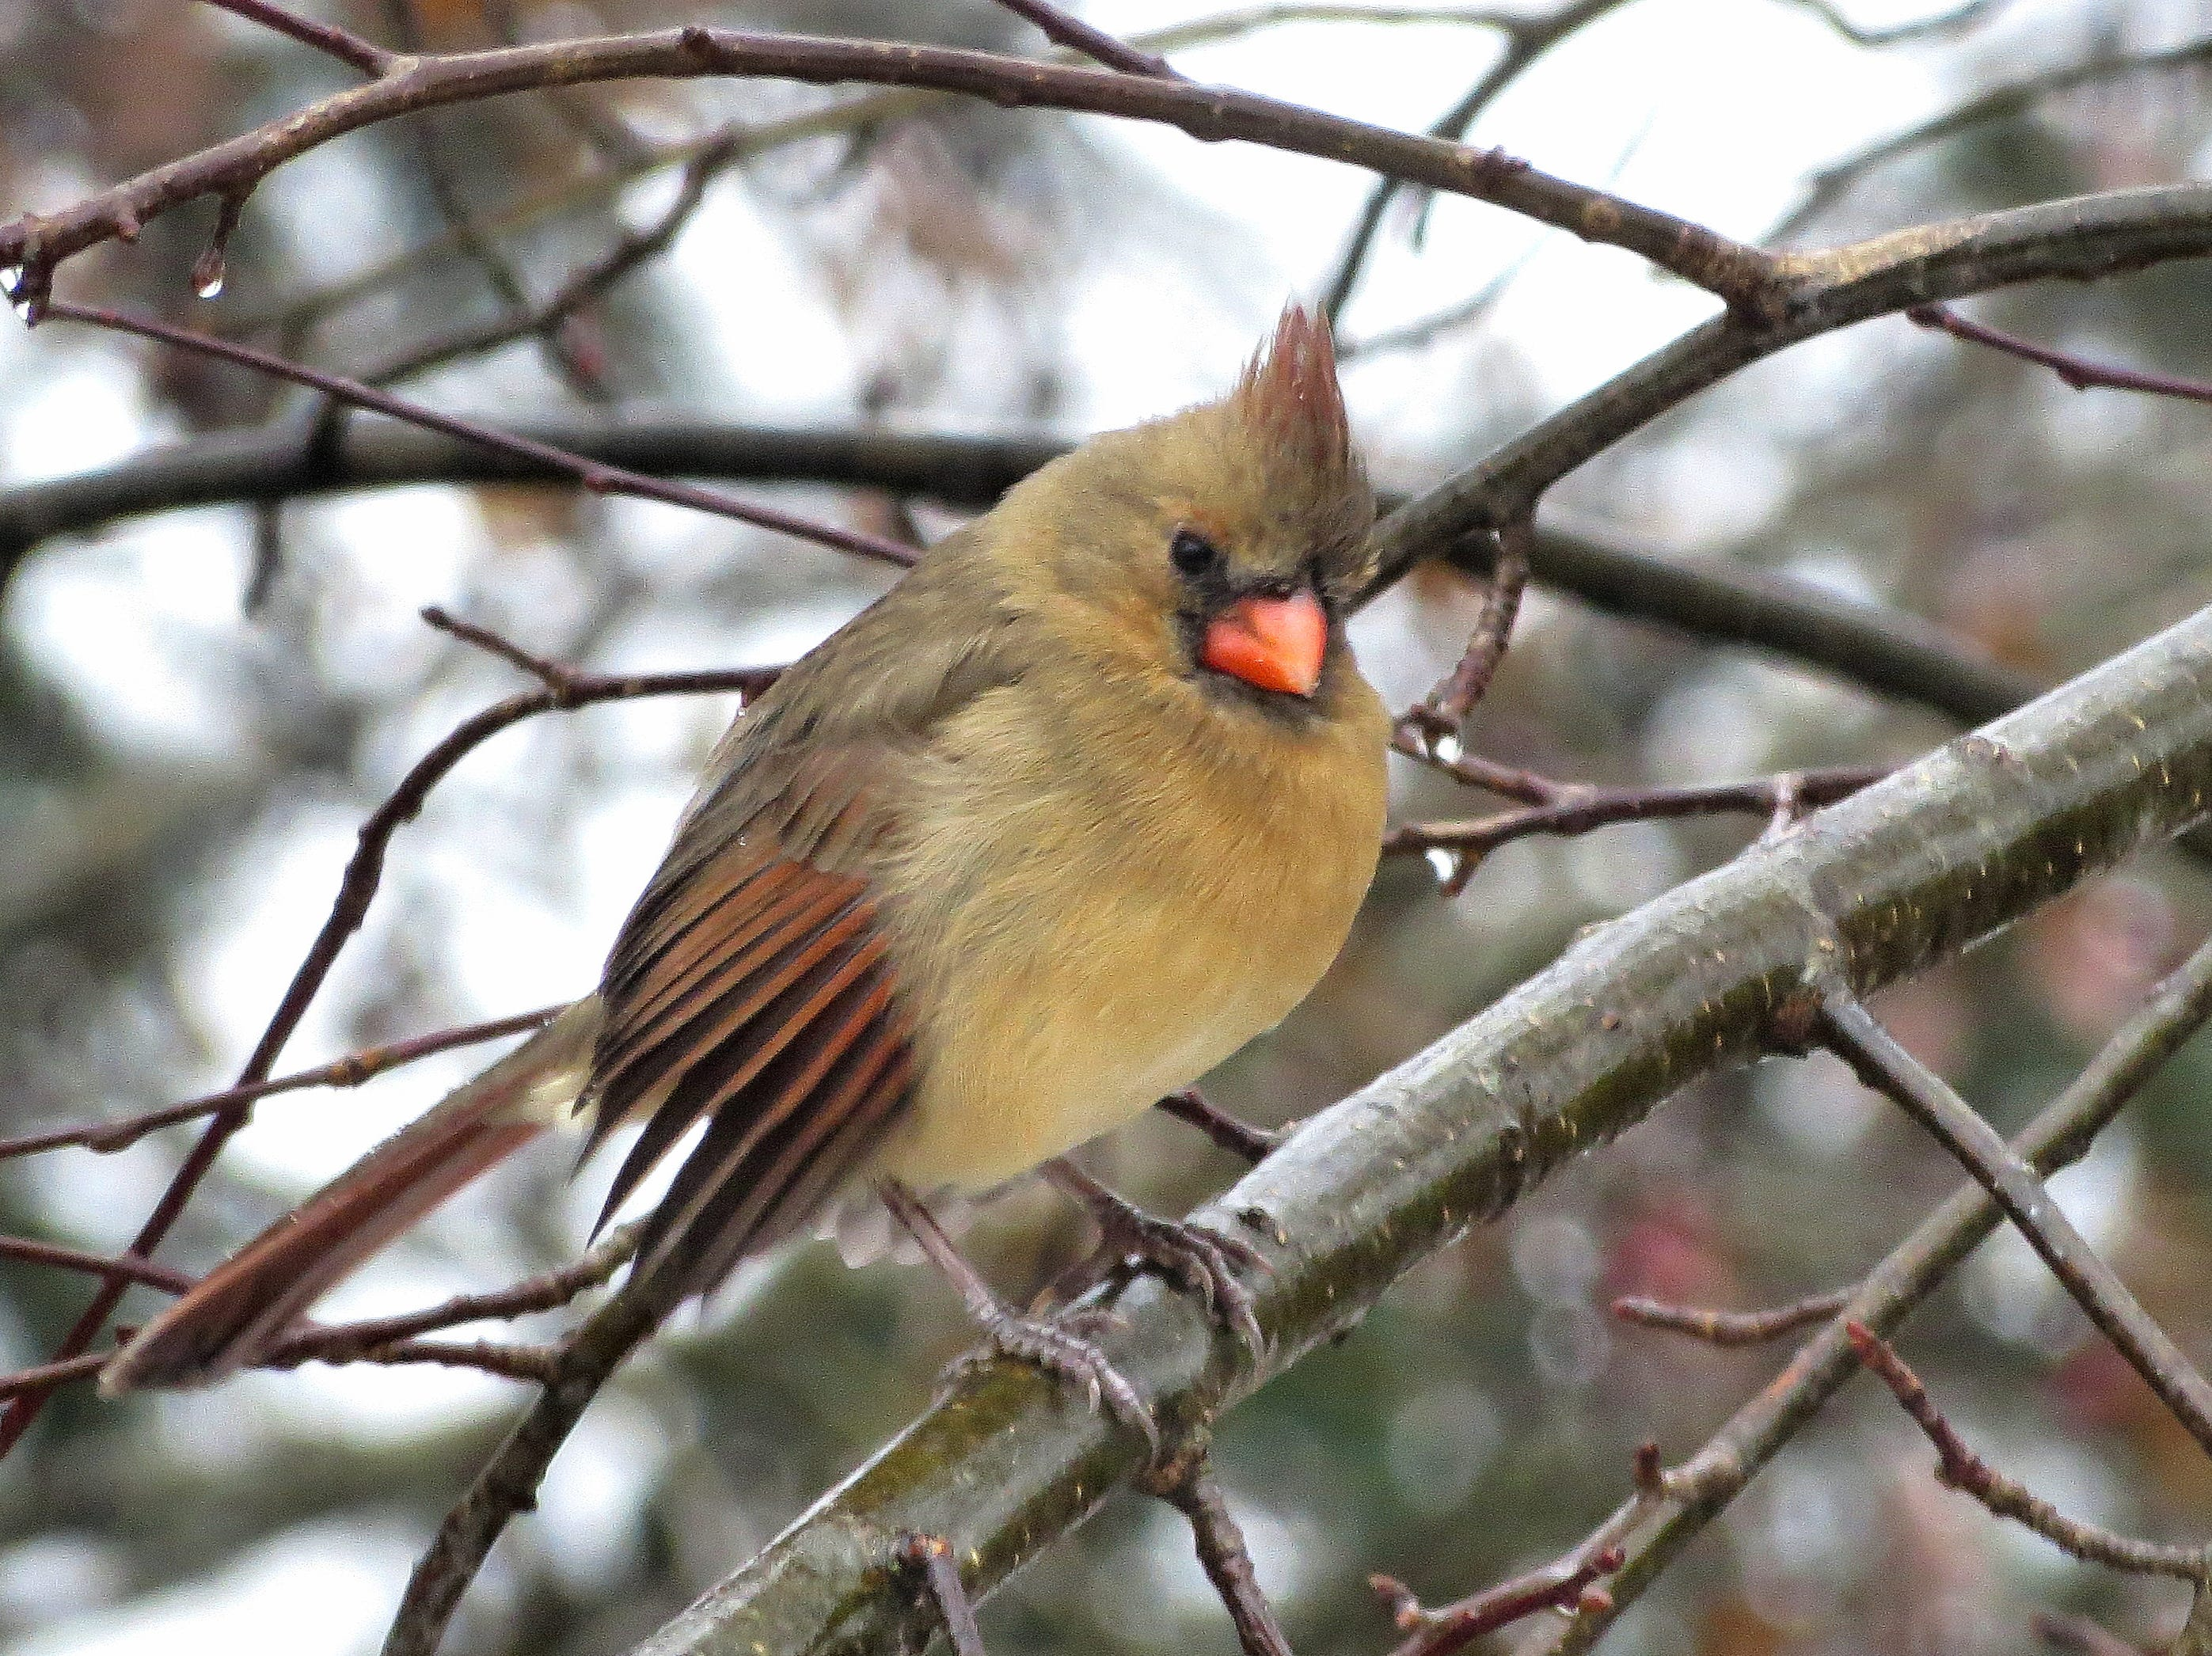 Female cardinal, Greendale.